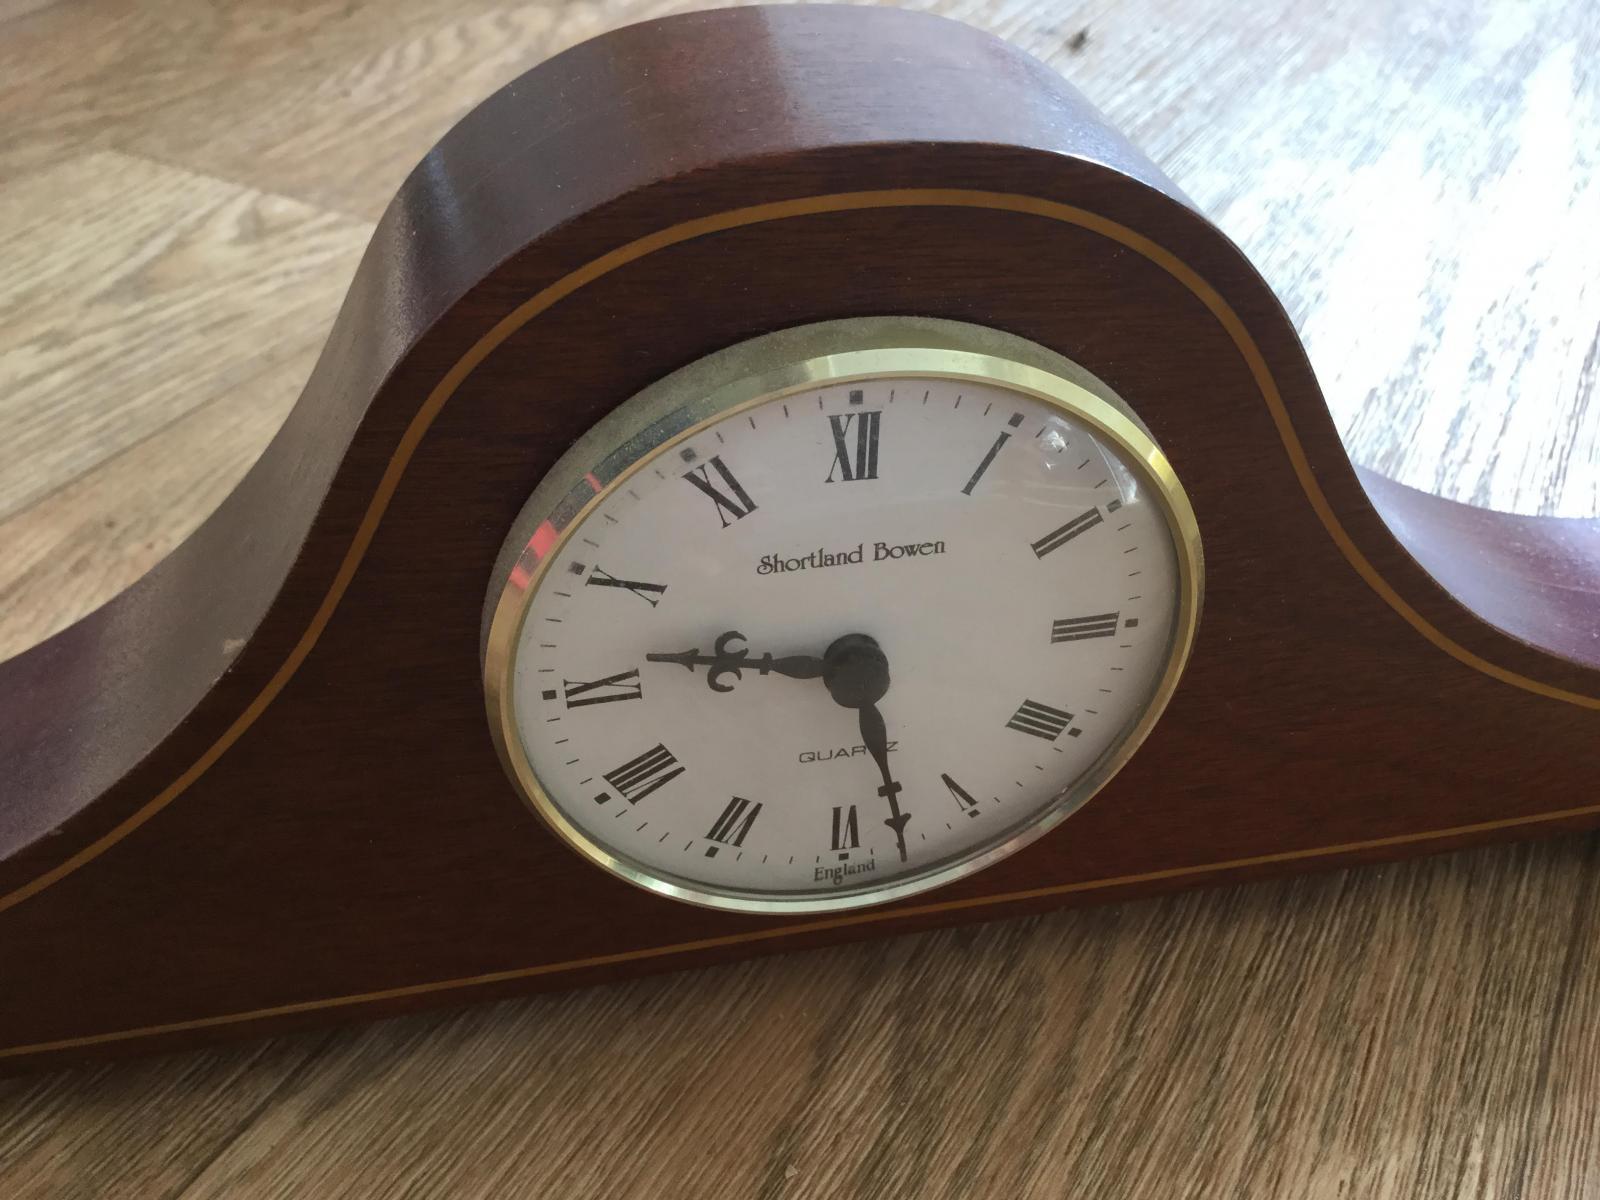 Why do we change the clocks?